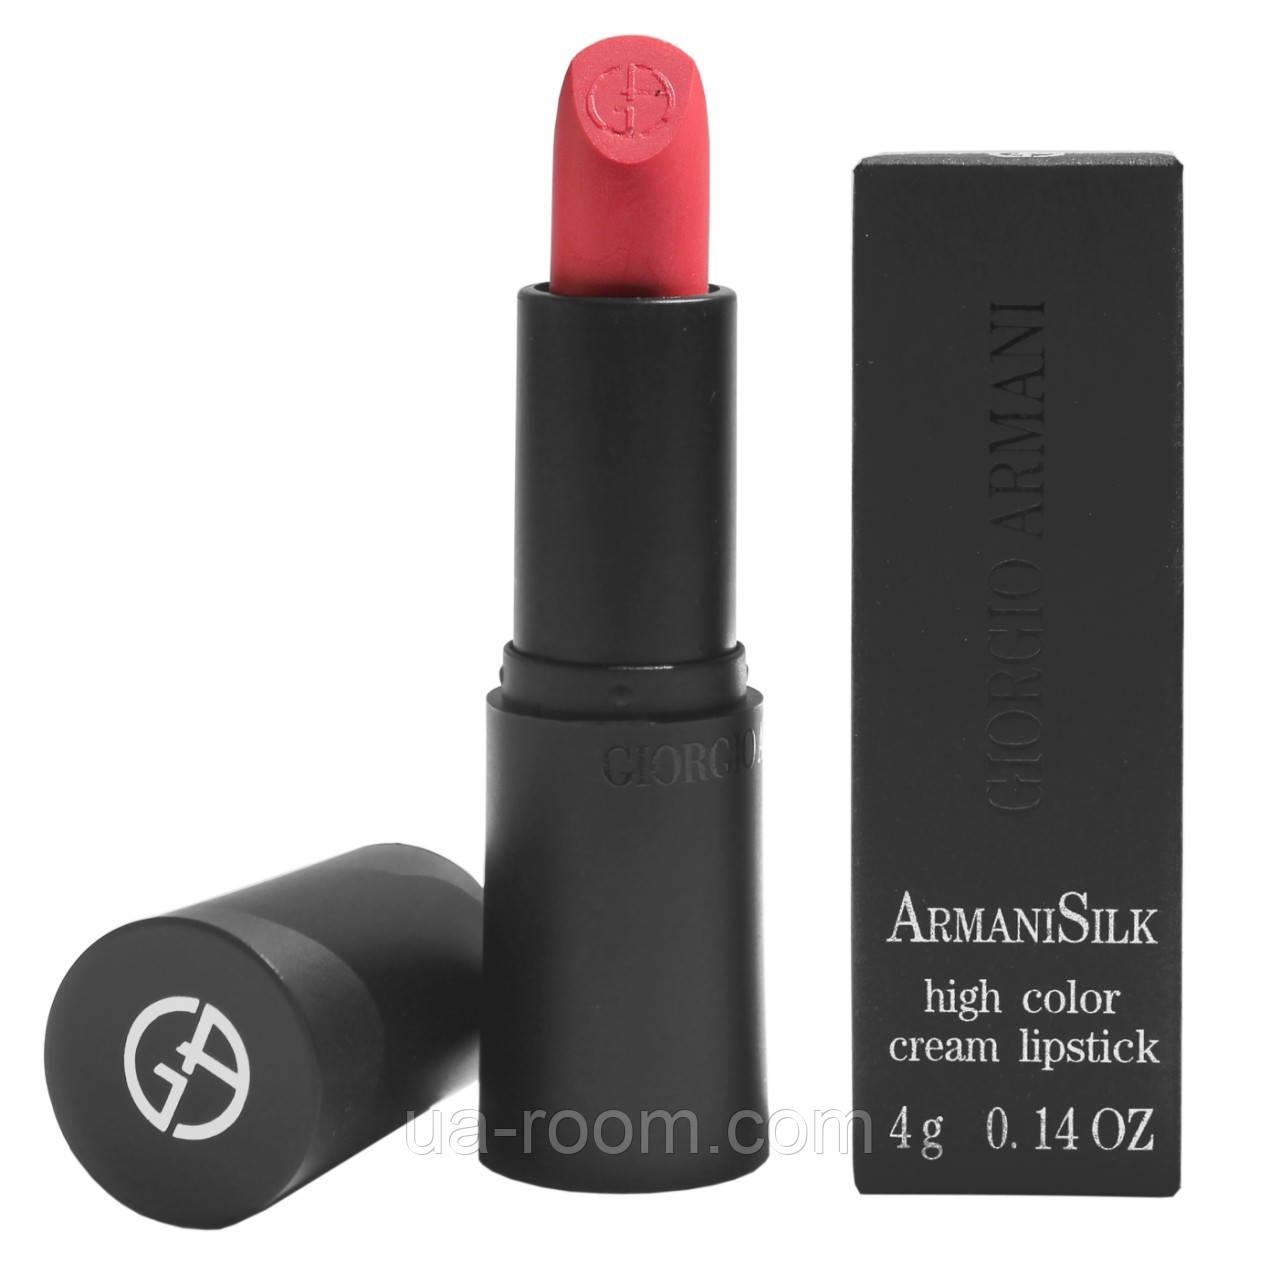 Помада для губ Giorgio Armani Silk High Color Cream Lipstick